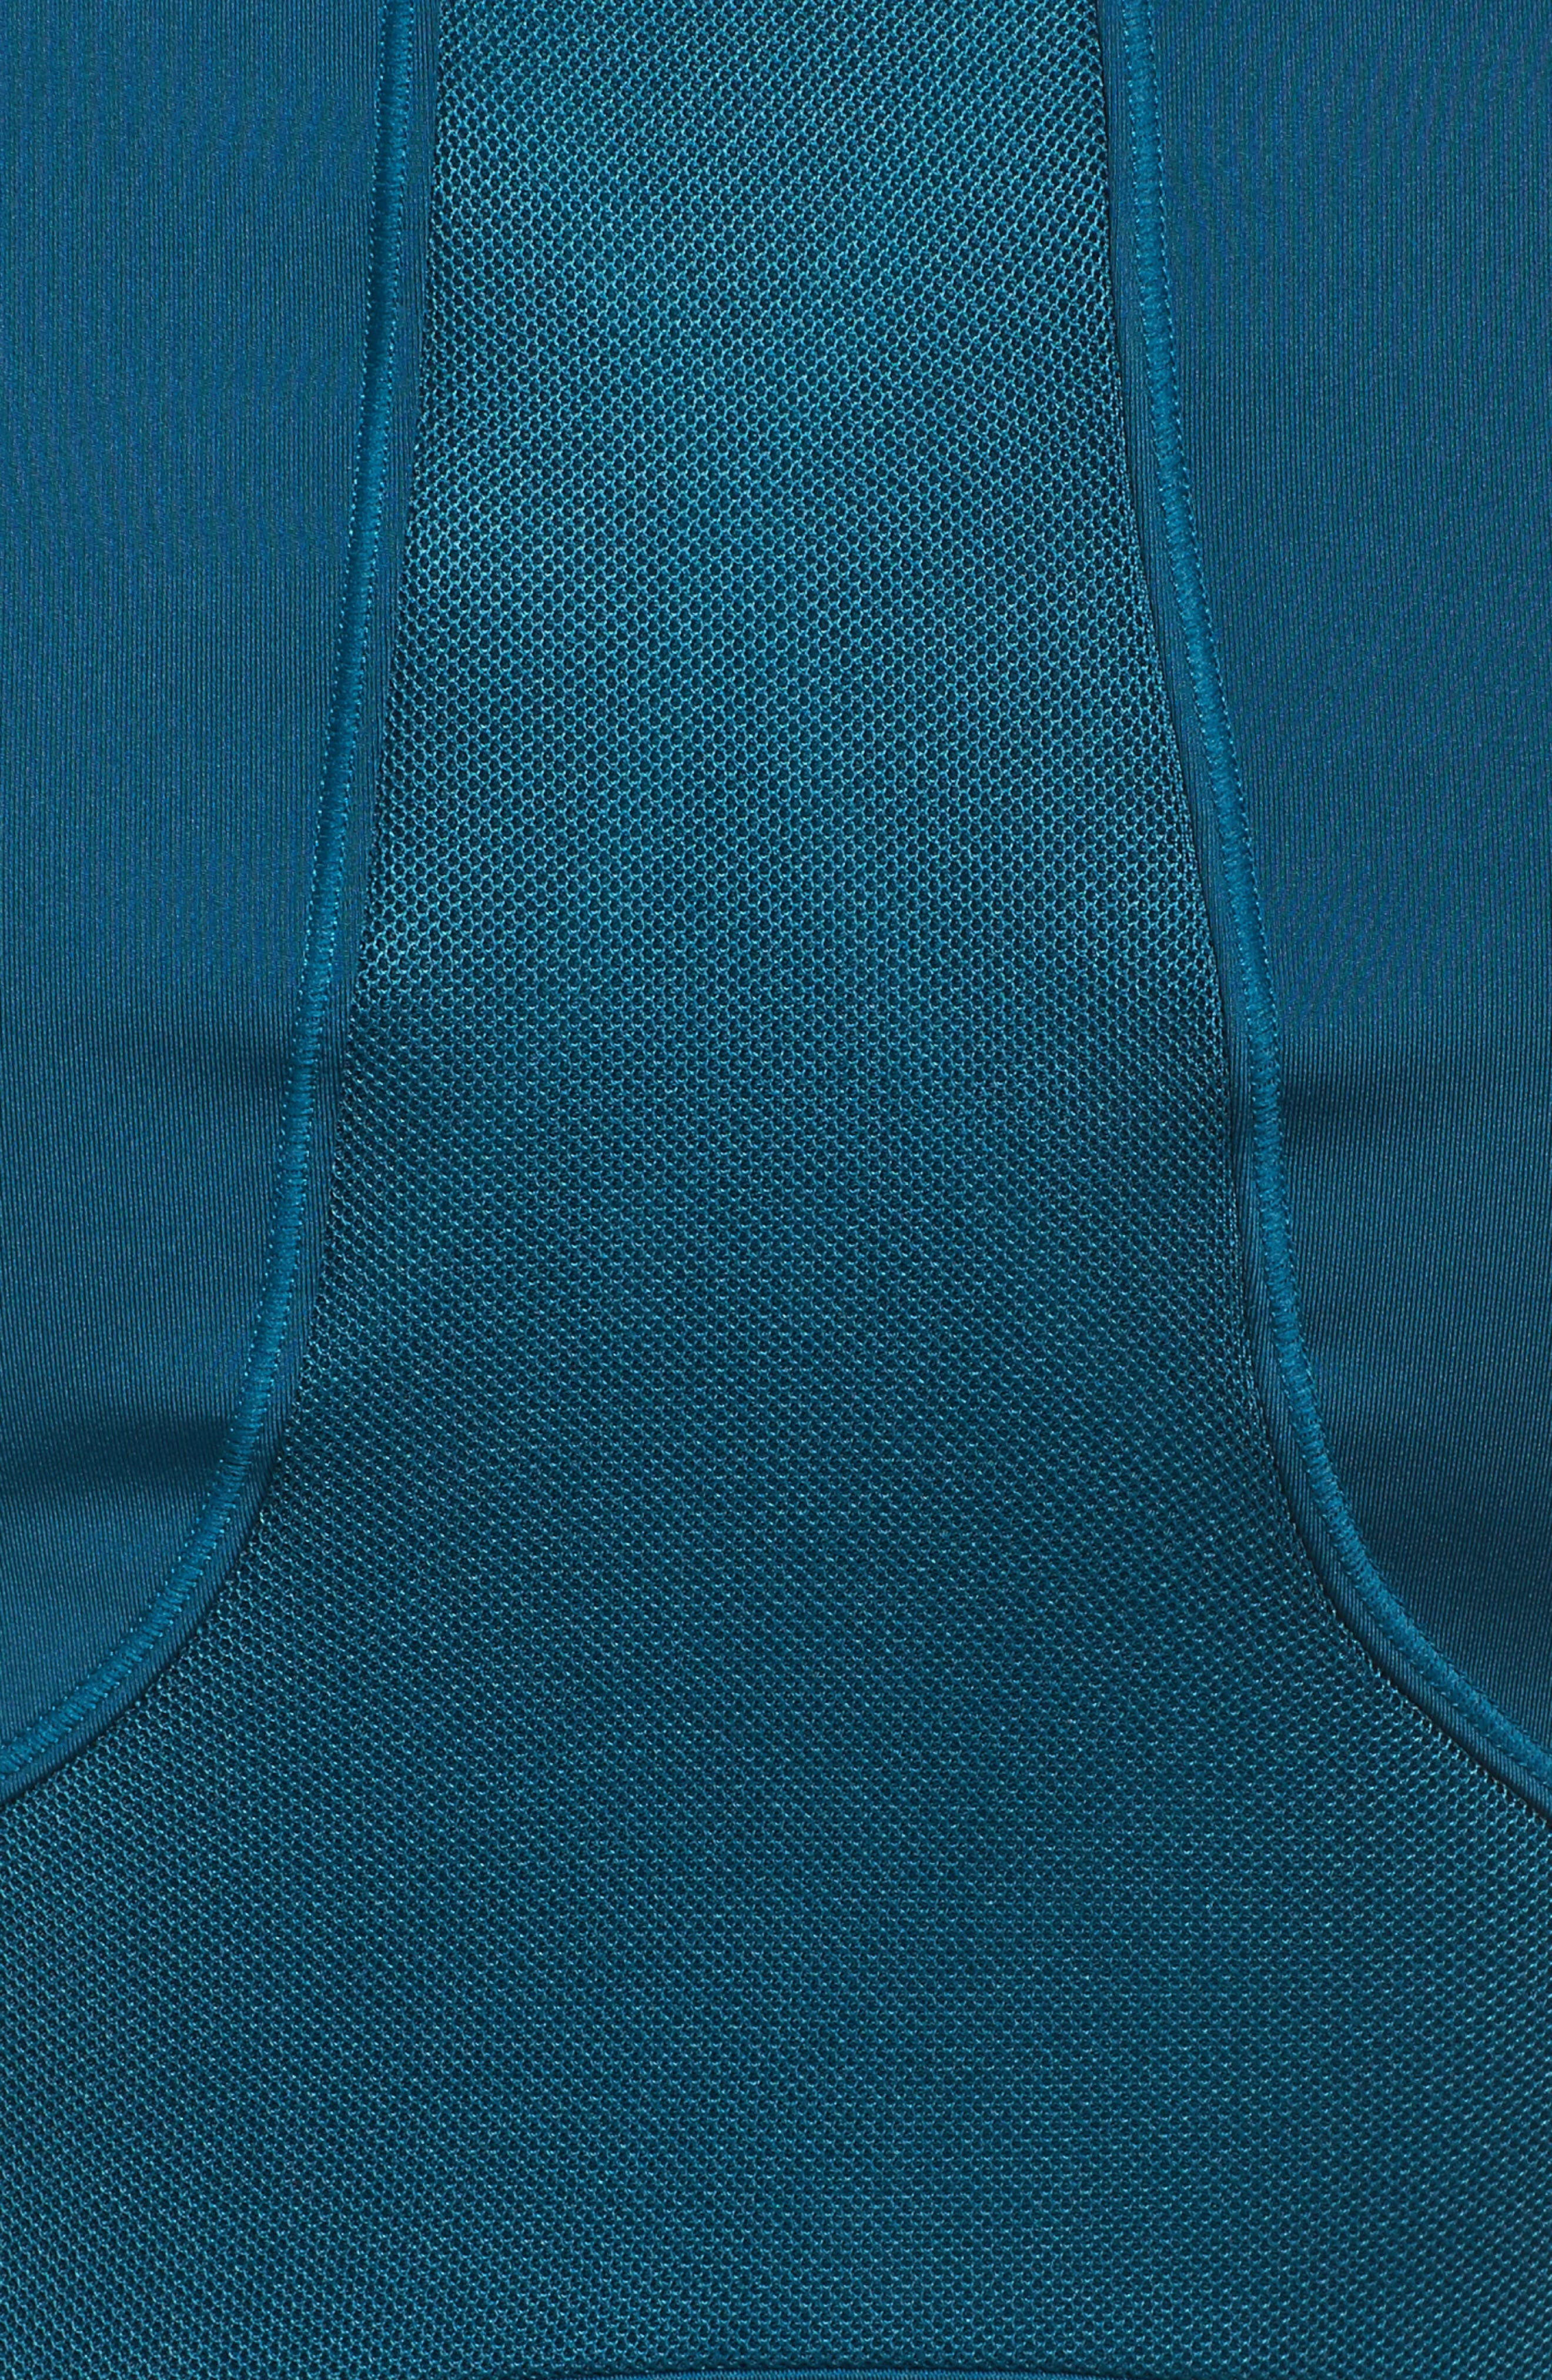 Breathelux Hooded Jacket,                             Alternate thumbnail 6, color,                             Tourmaline Teal